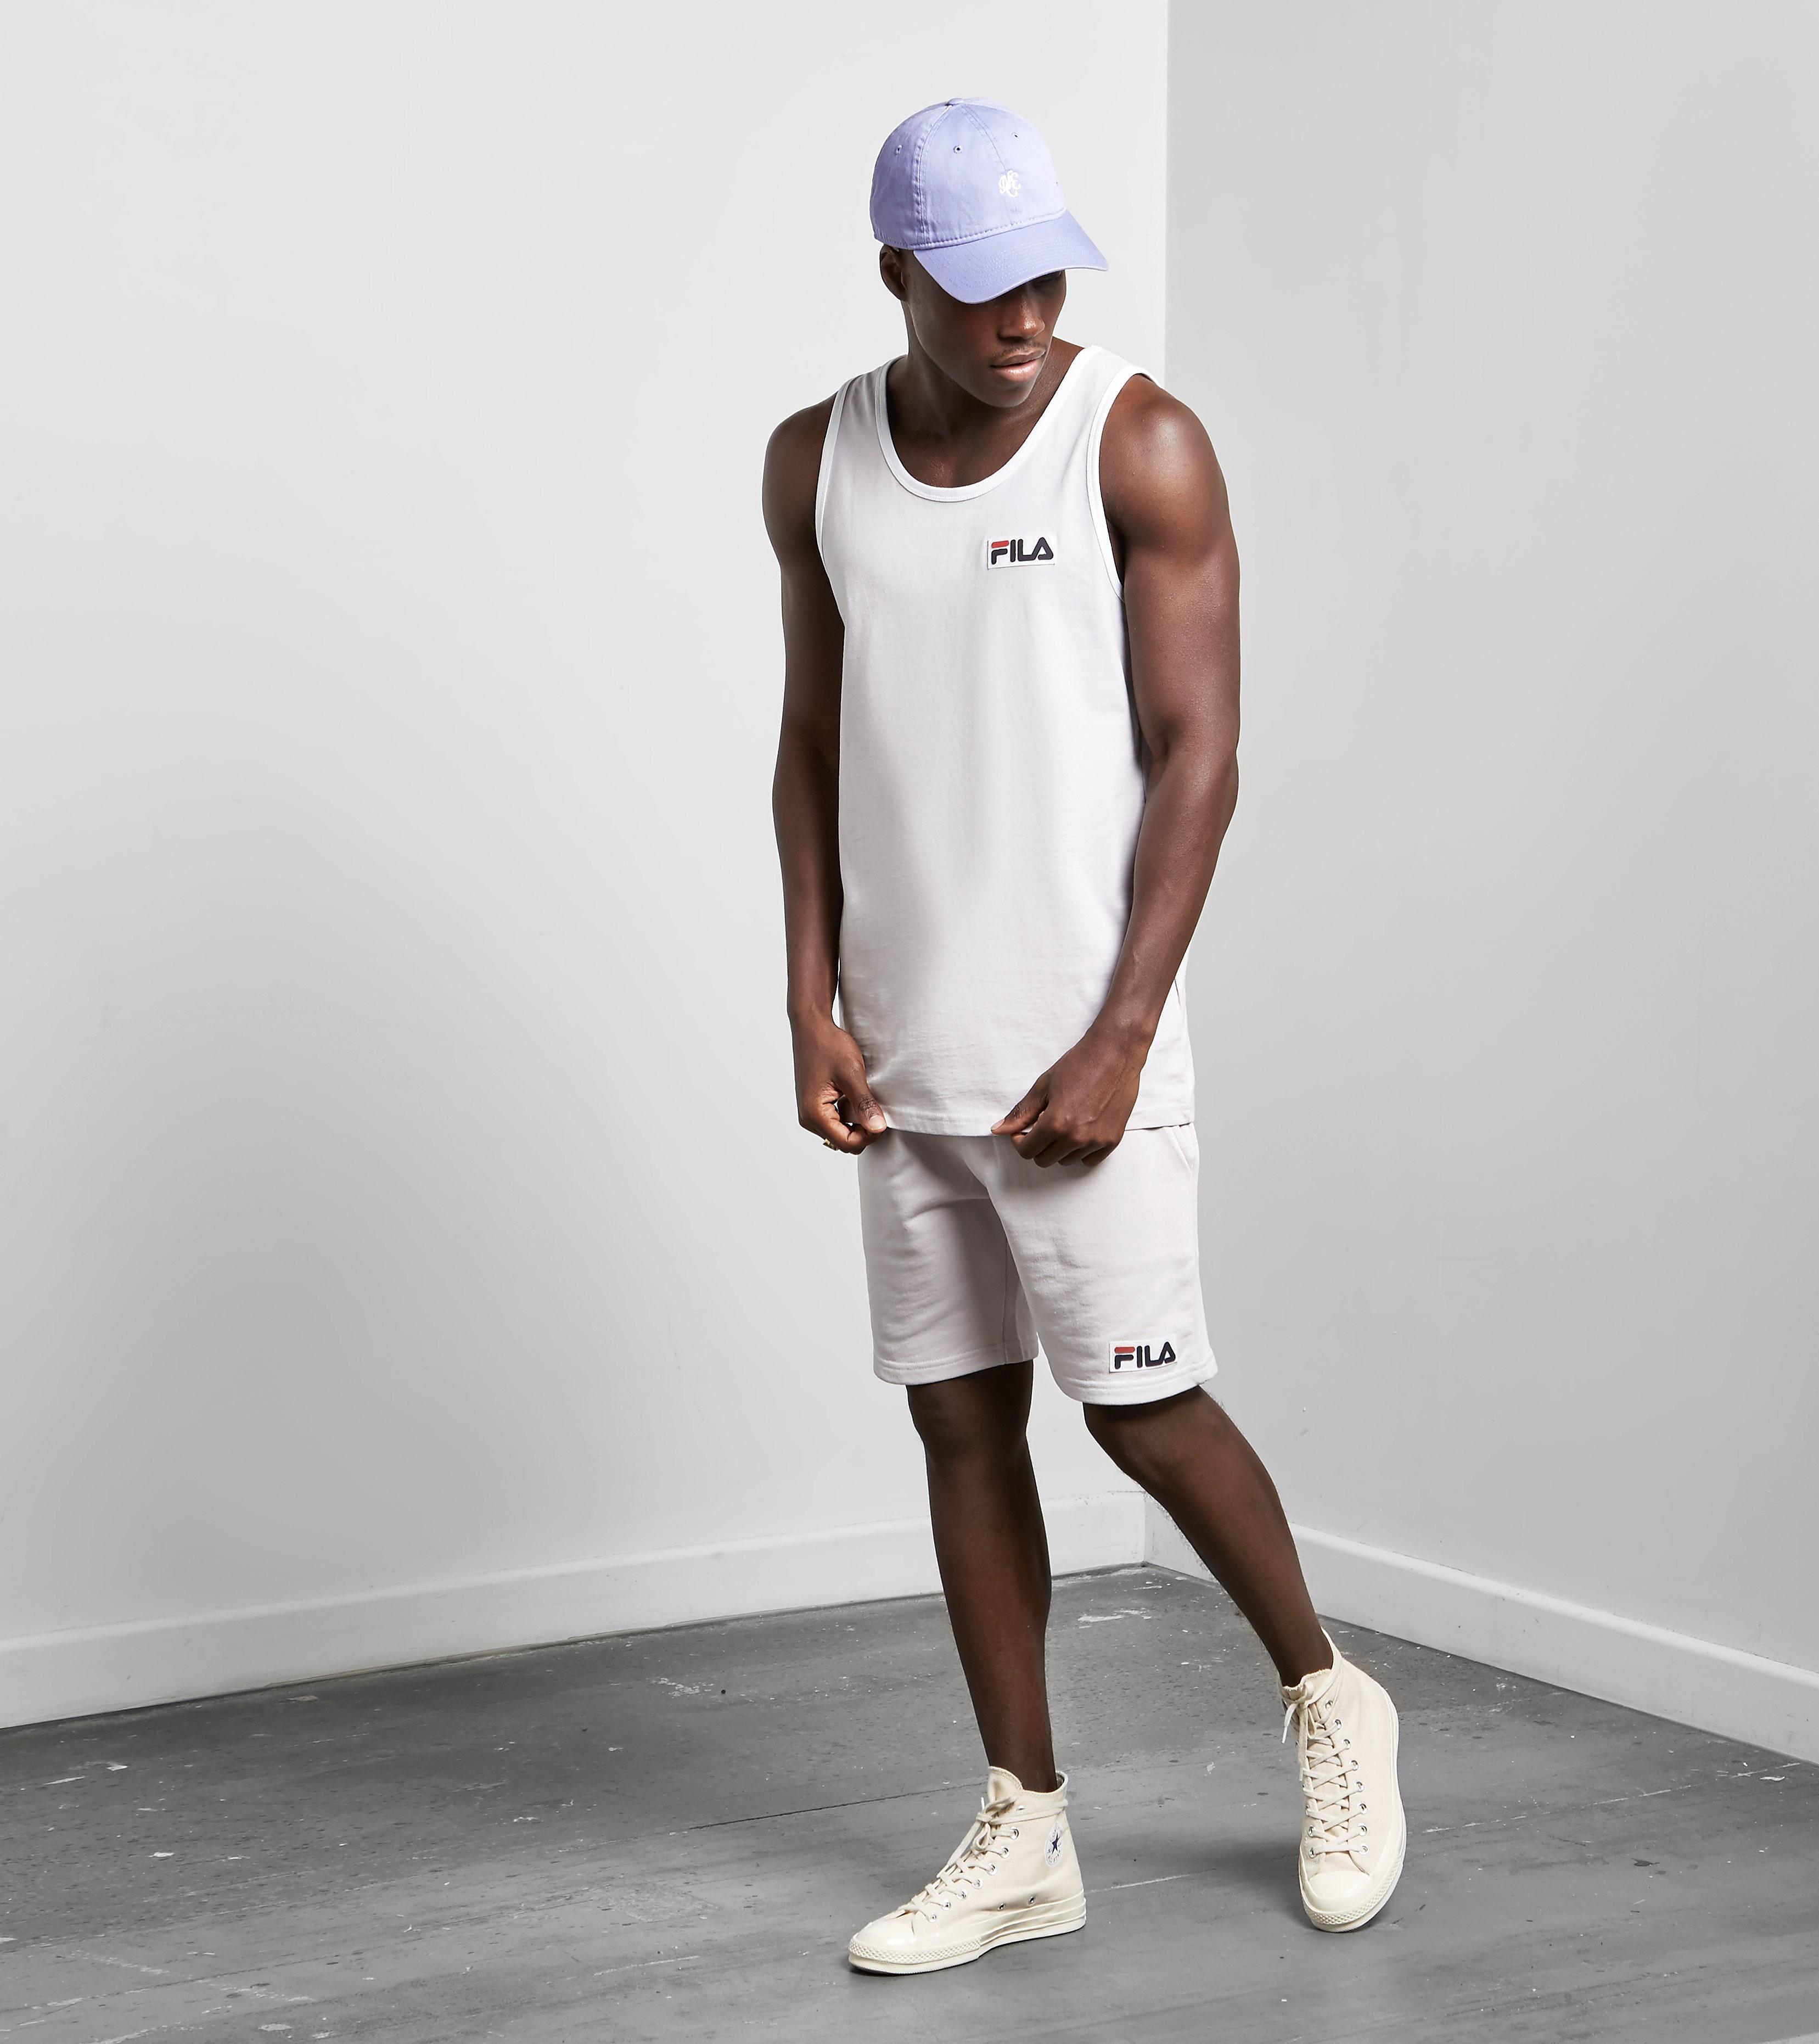 Fila Lighter Vest - size? Exclusive